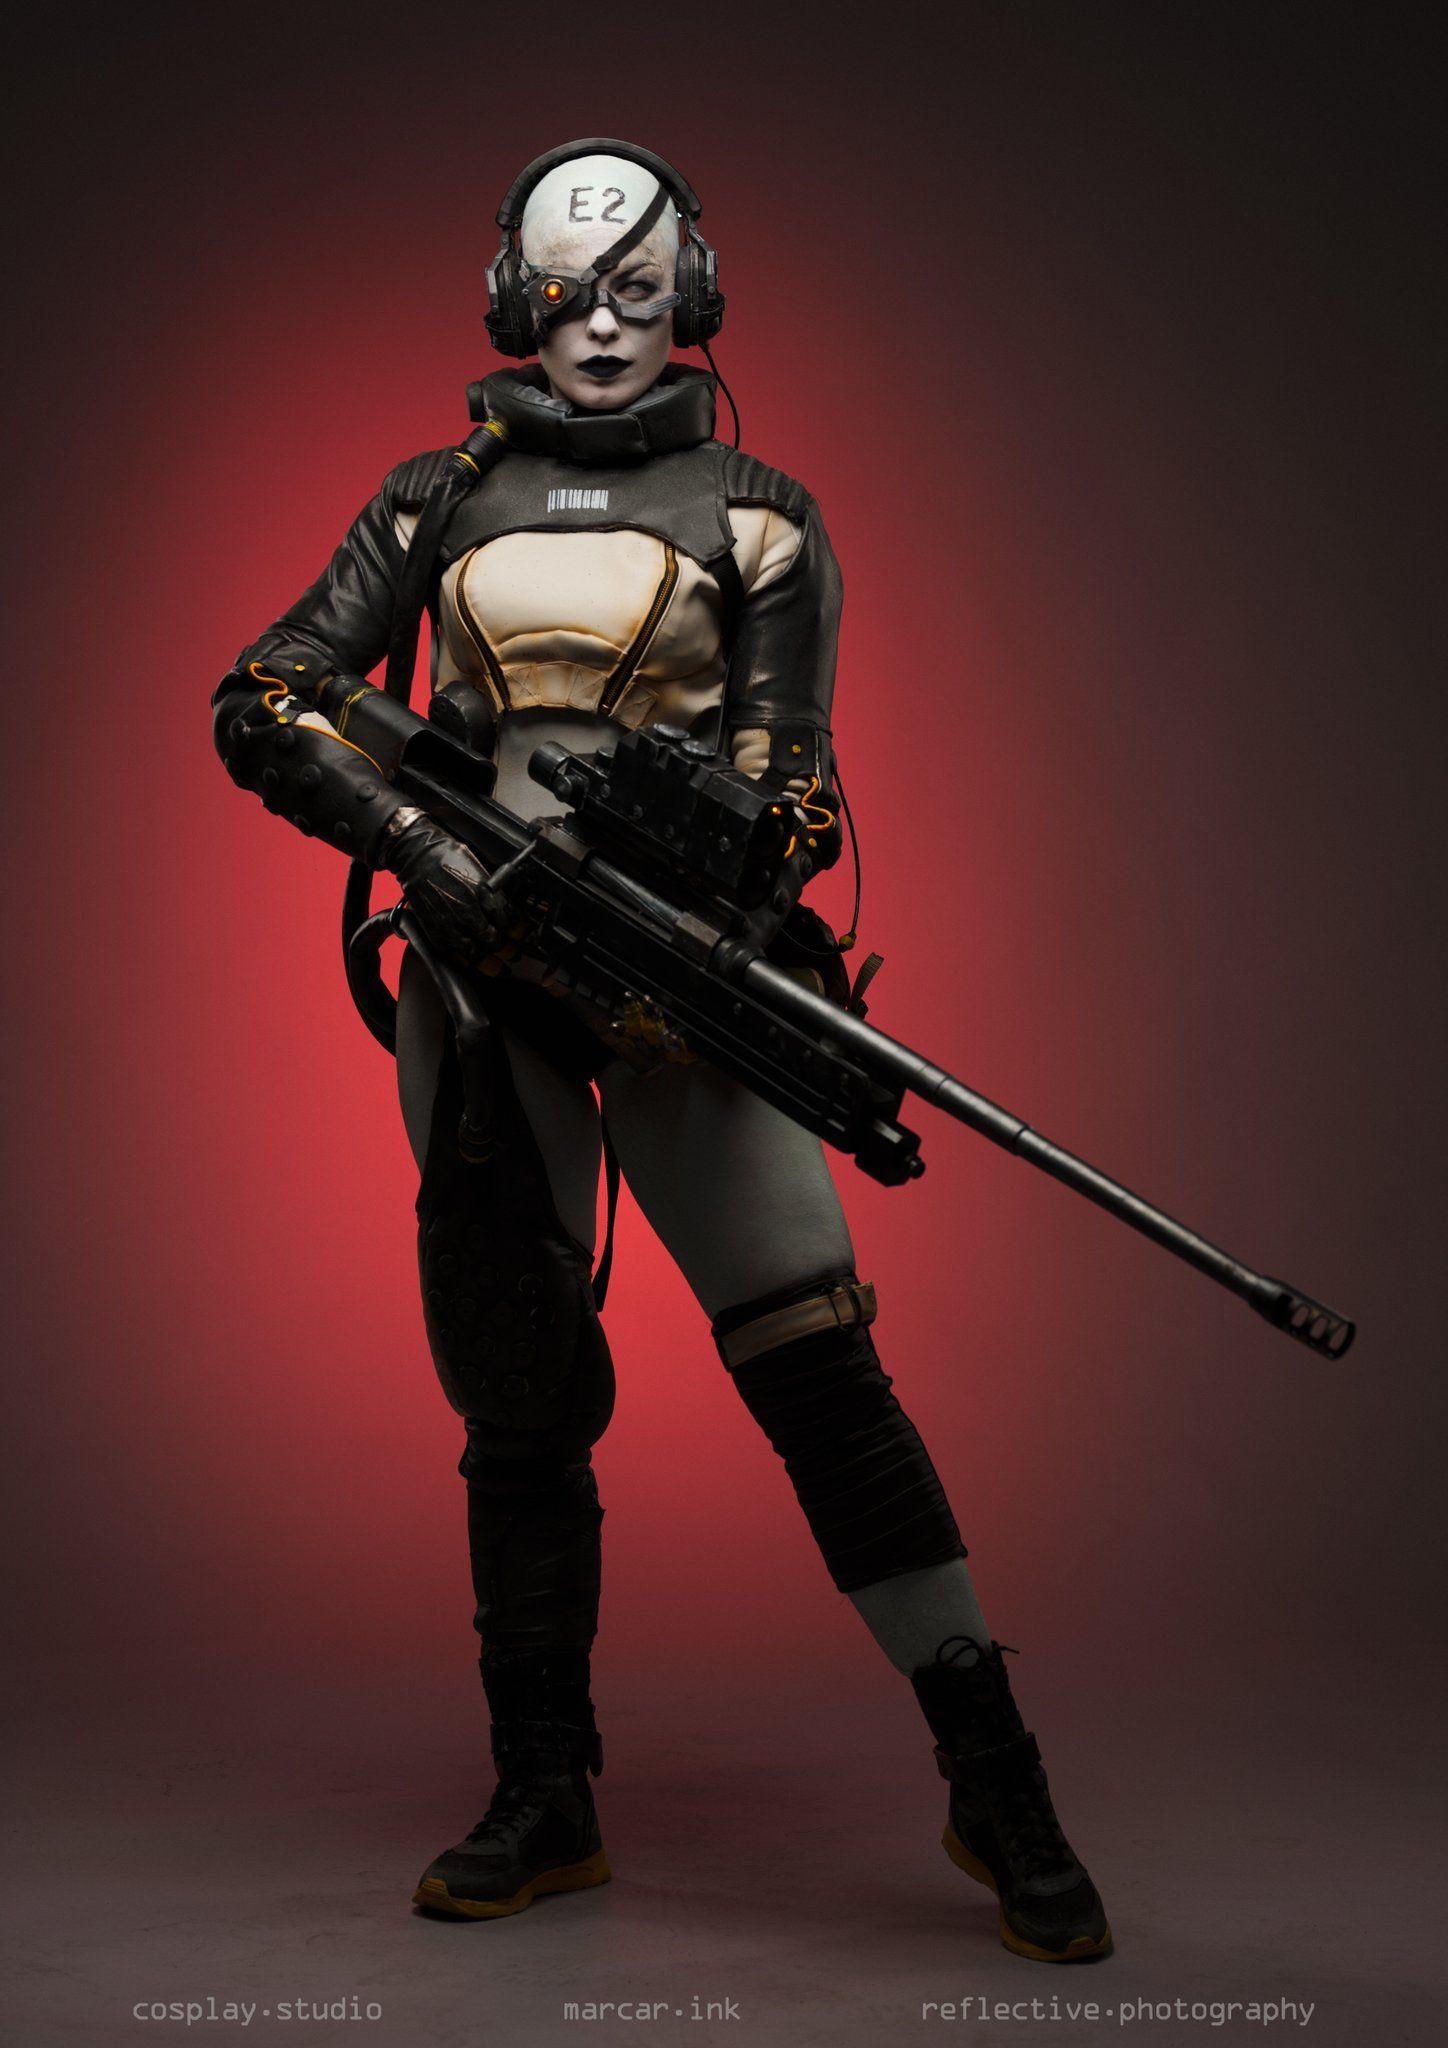 Sniper Skull cosplay by Cryocanine #MetalGearSolid #mgs #MGSV #MetalGear #Konami #cosplay #PS4 #game #MGSVTPP